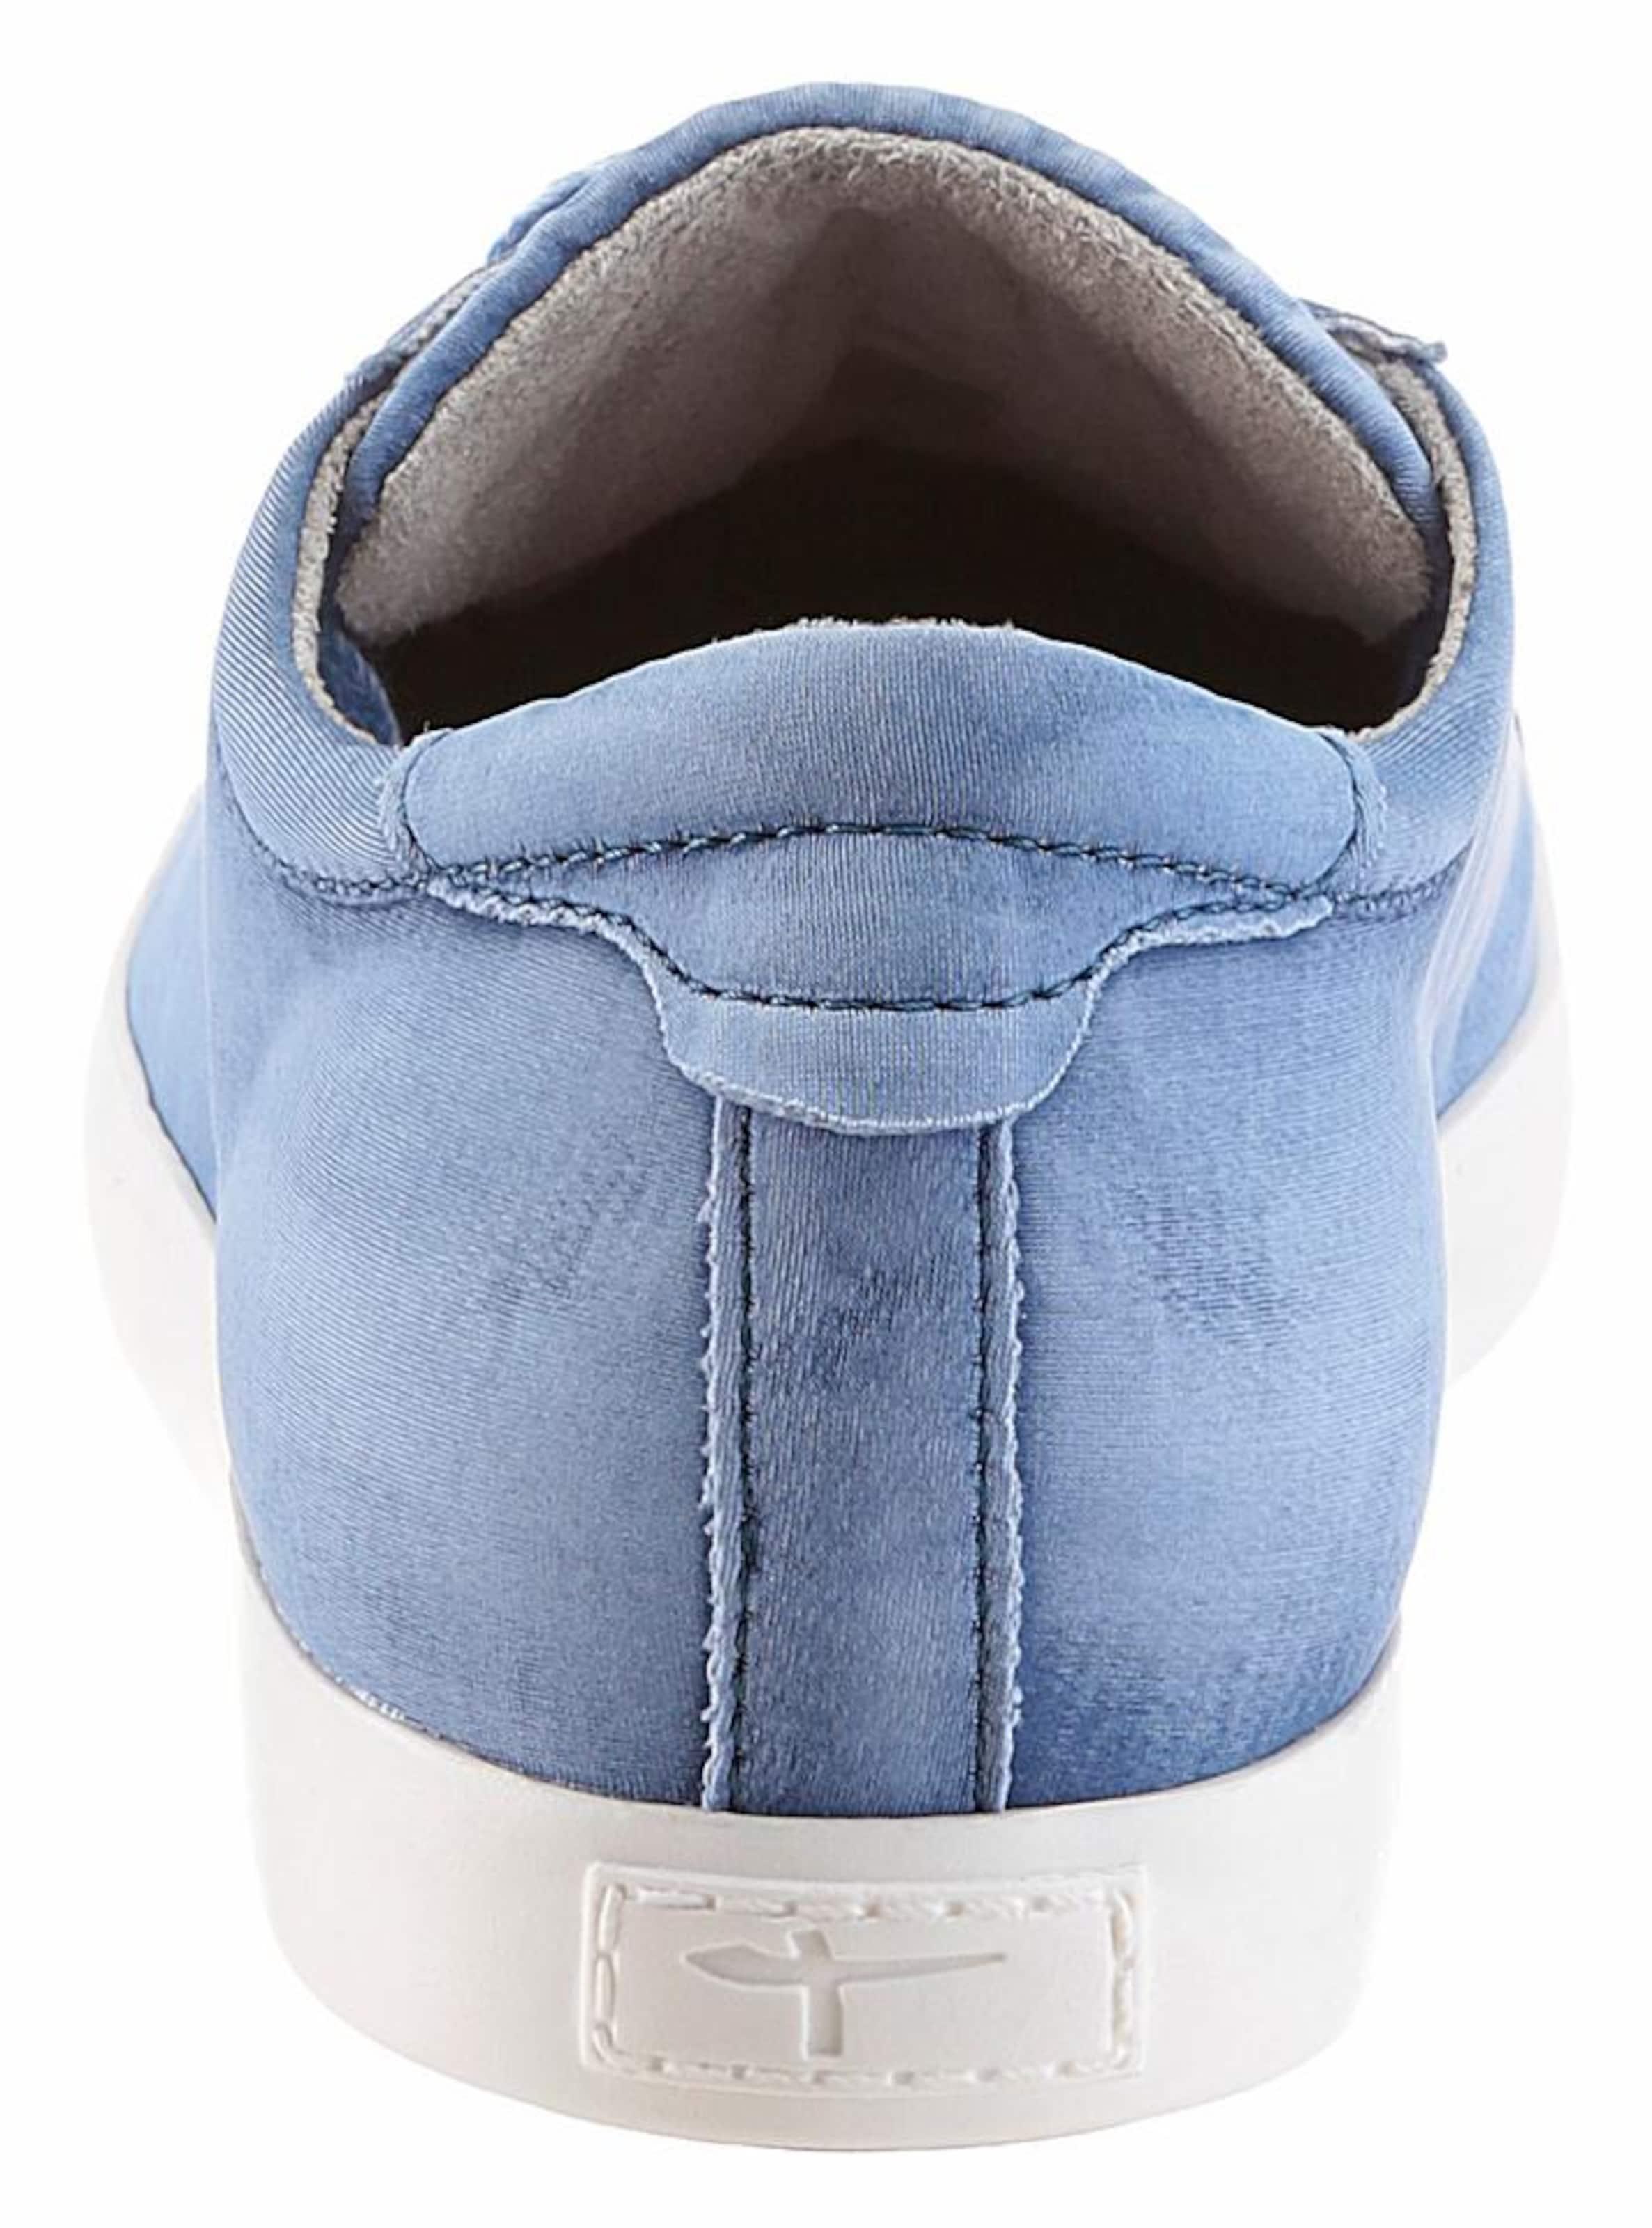 TAMARIS Sneaker Verkauf Blick qP6AIJ